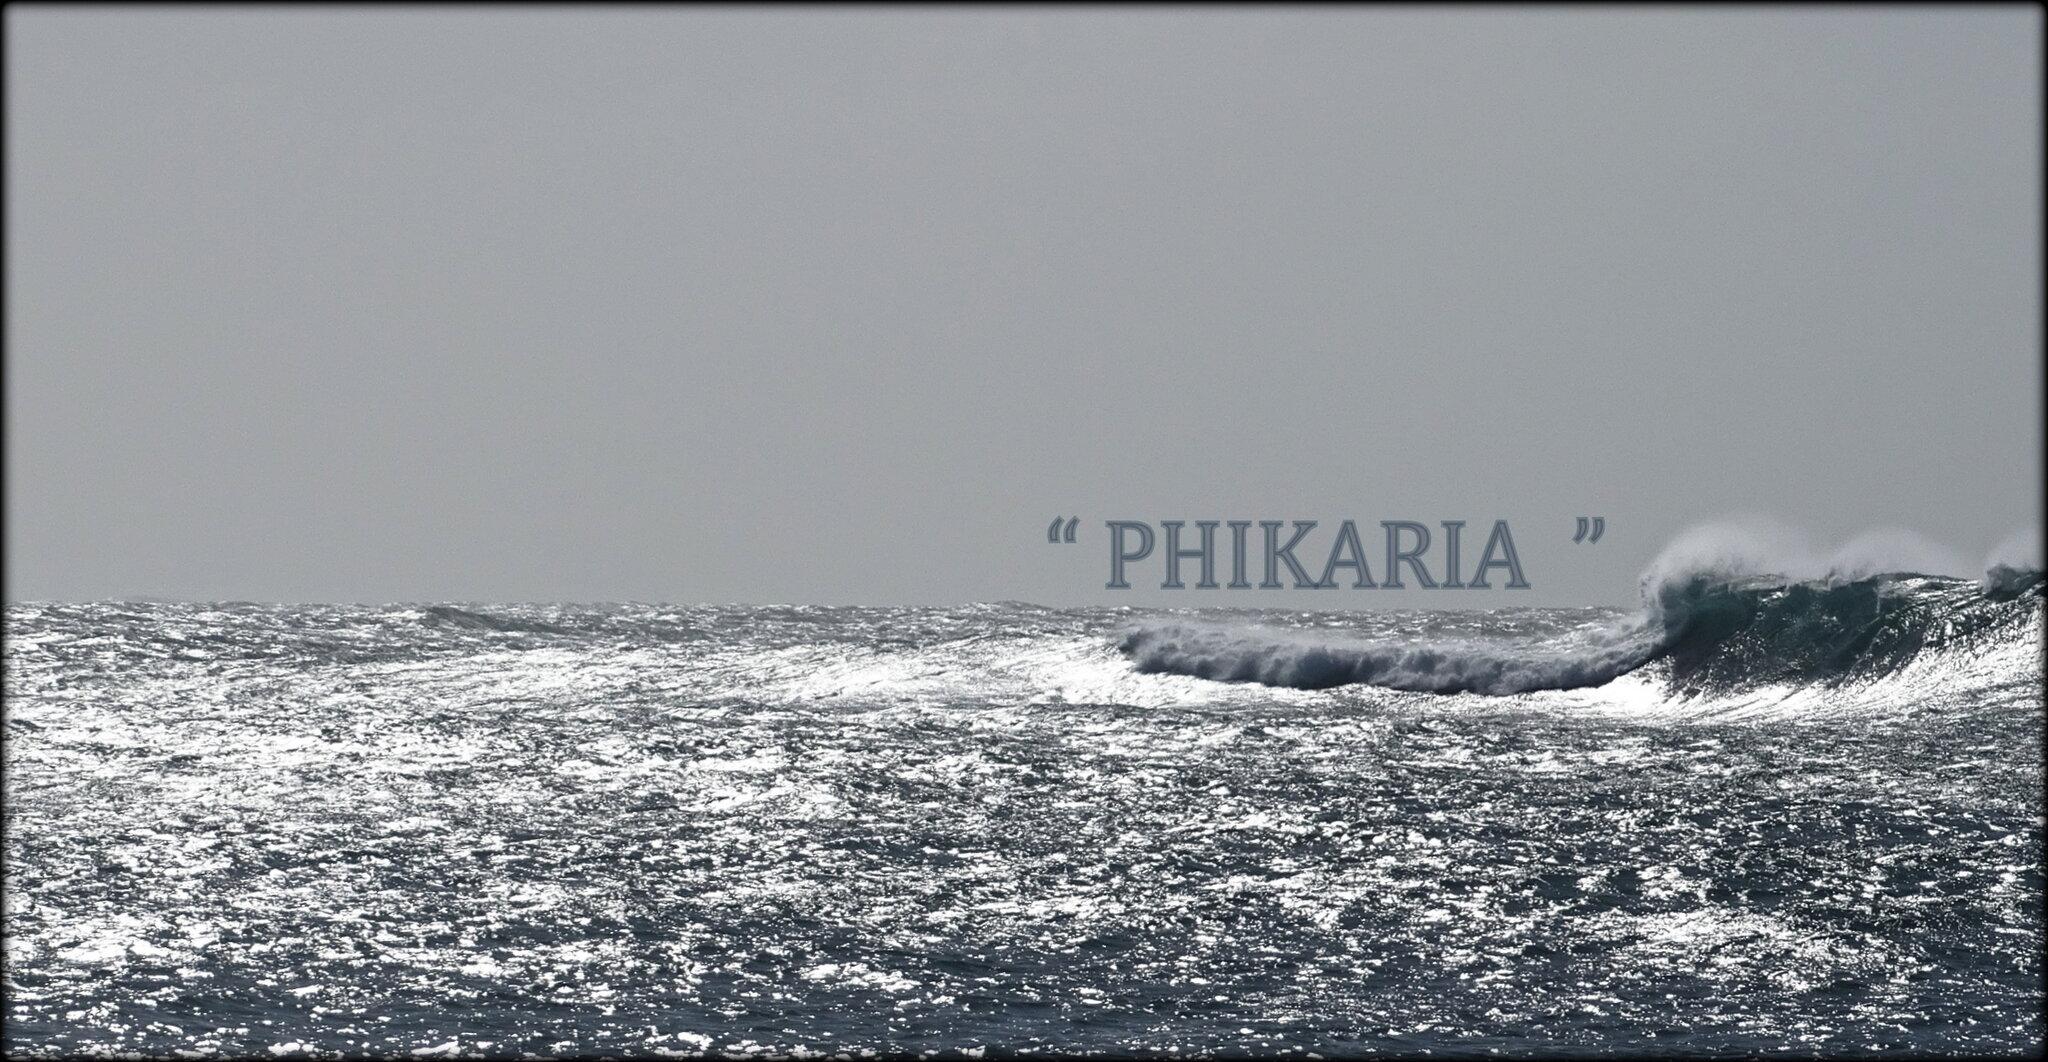 LE_MUR___PHIKARIA_